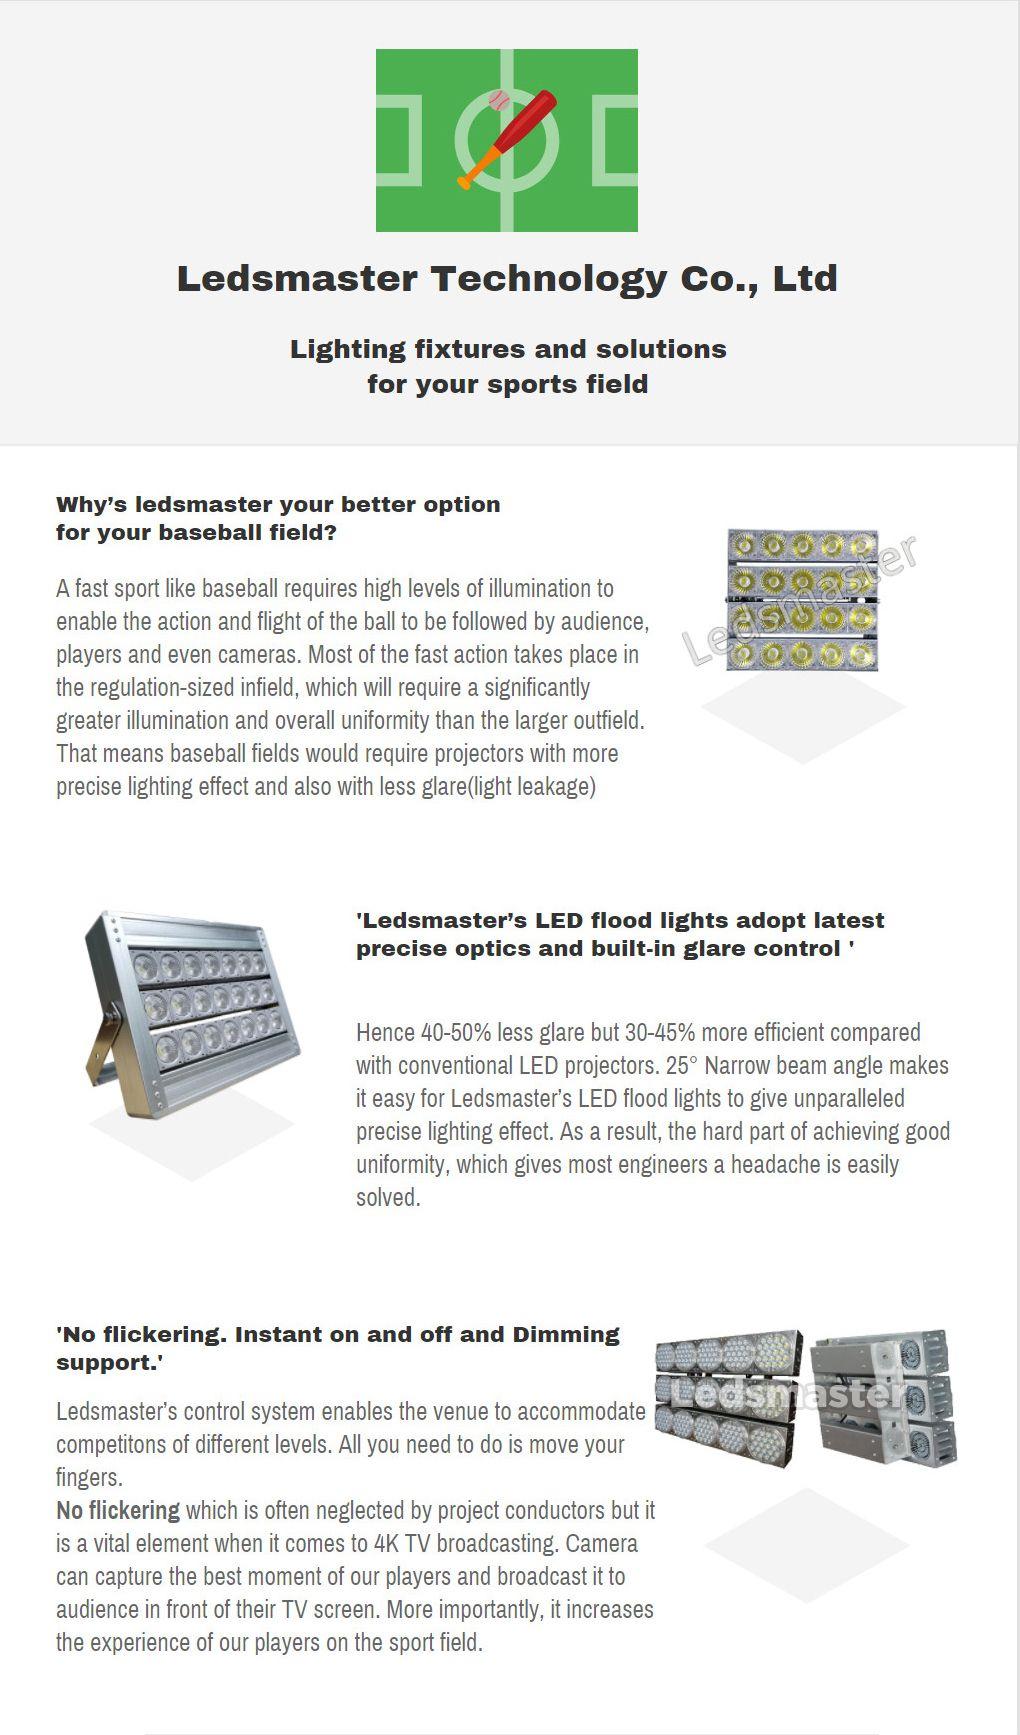 Baseball Field Lighting Cost Lamp Price Running Cost And Maintenance Expenses Baseball Field Baseball Field